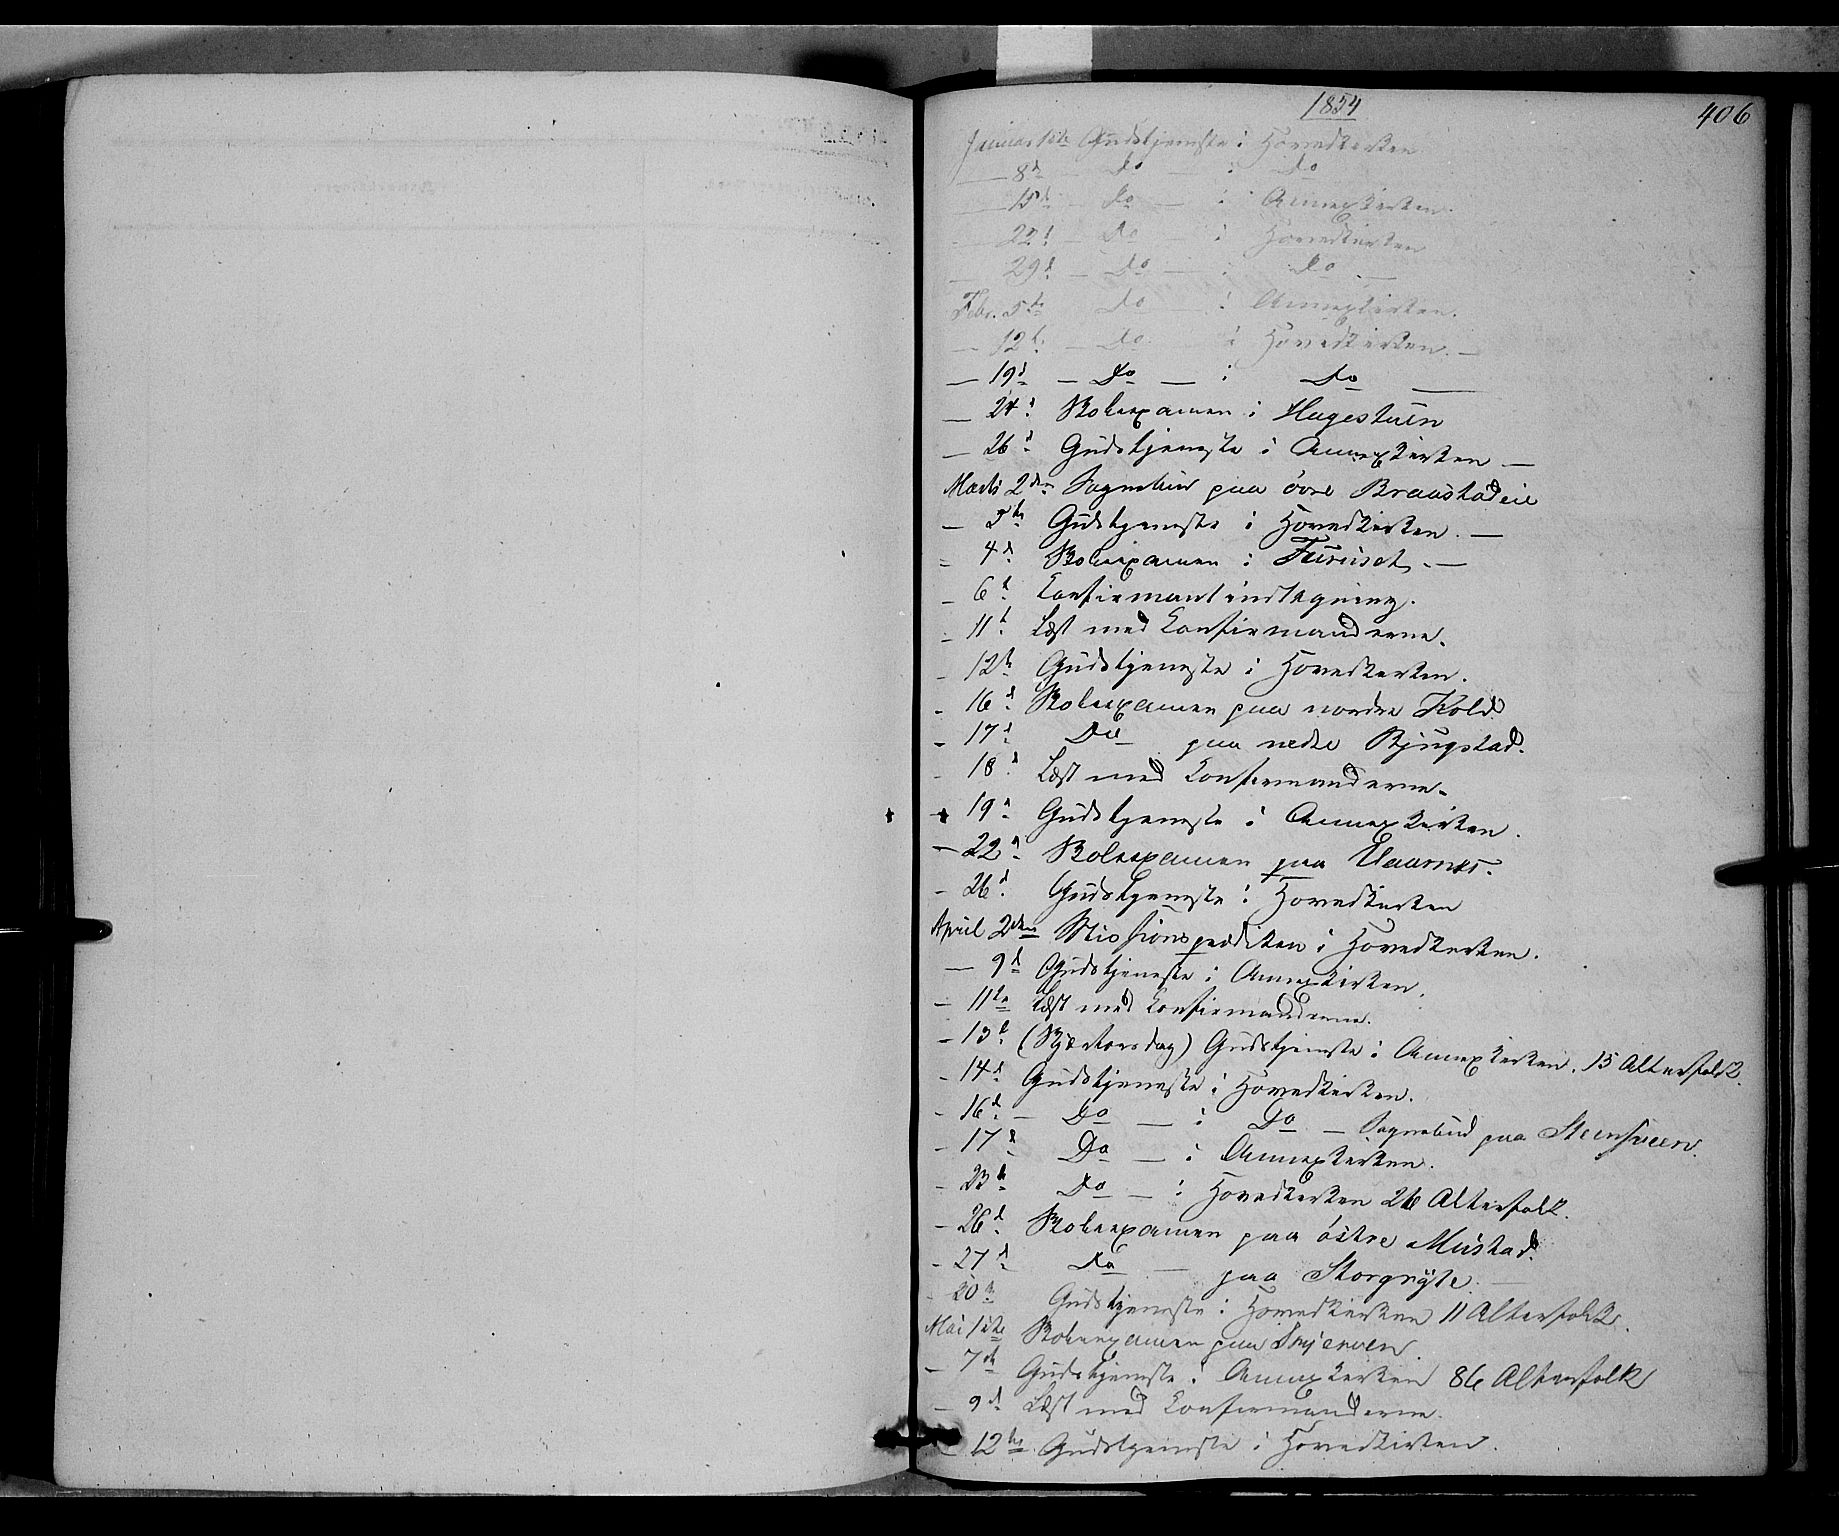 SAH, Vardal prestekontor, H/Ha/Haa/L0006: Ministerialbok nr. 6, 1854-1866, s. 406